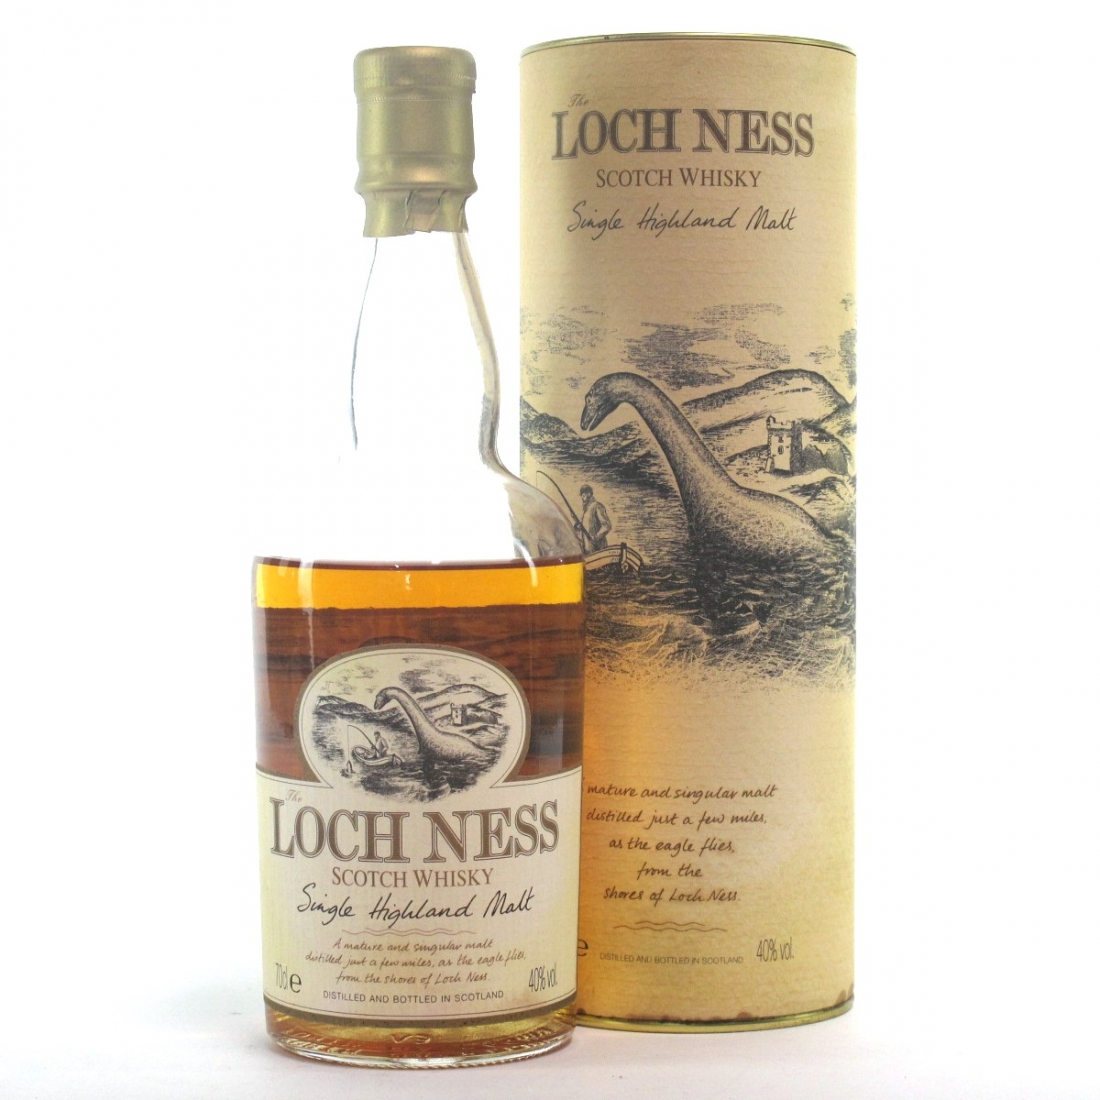 Loch Ness Highland Single Malt